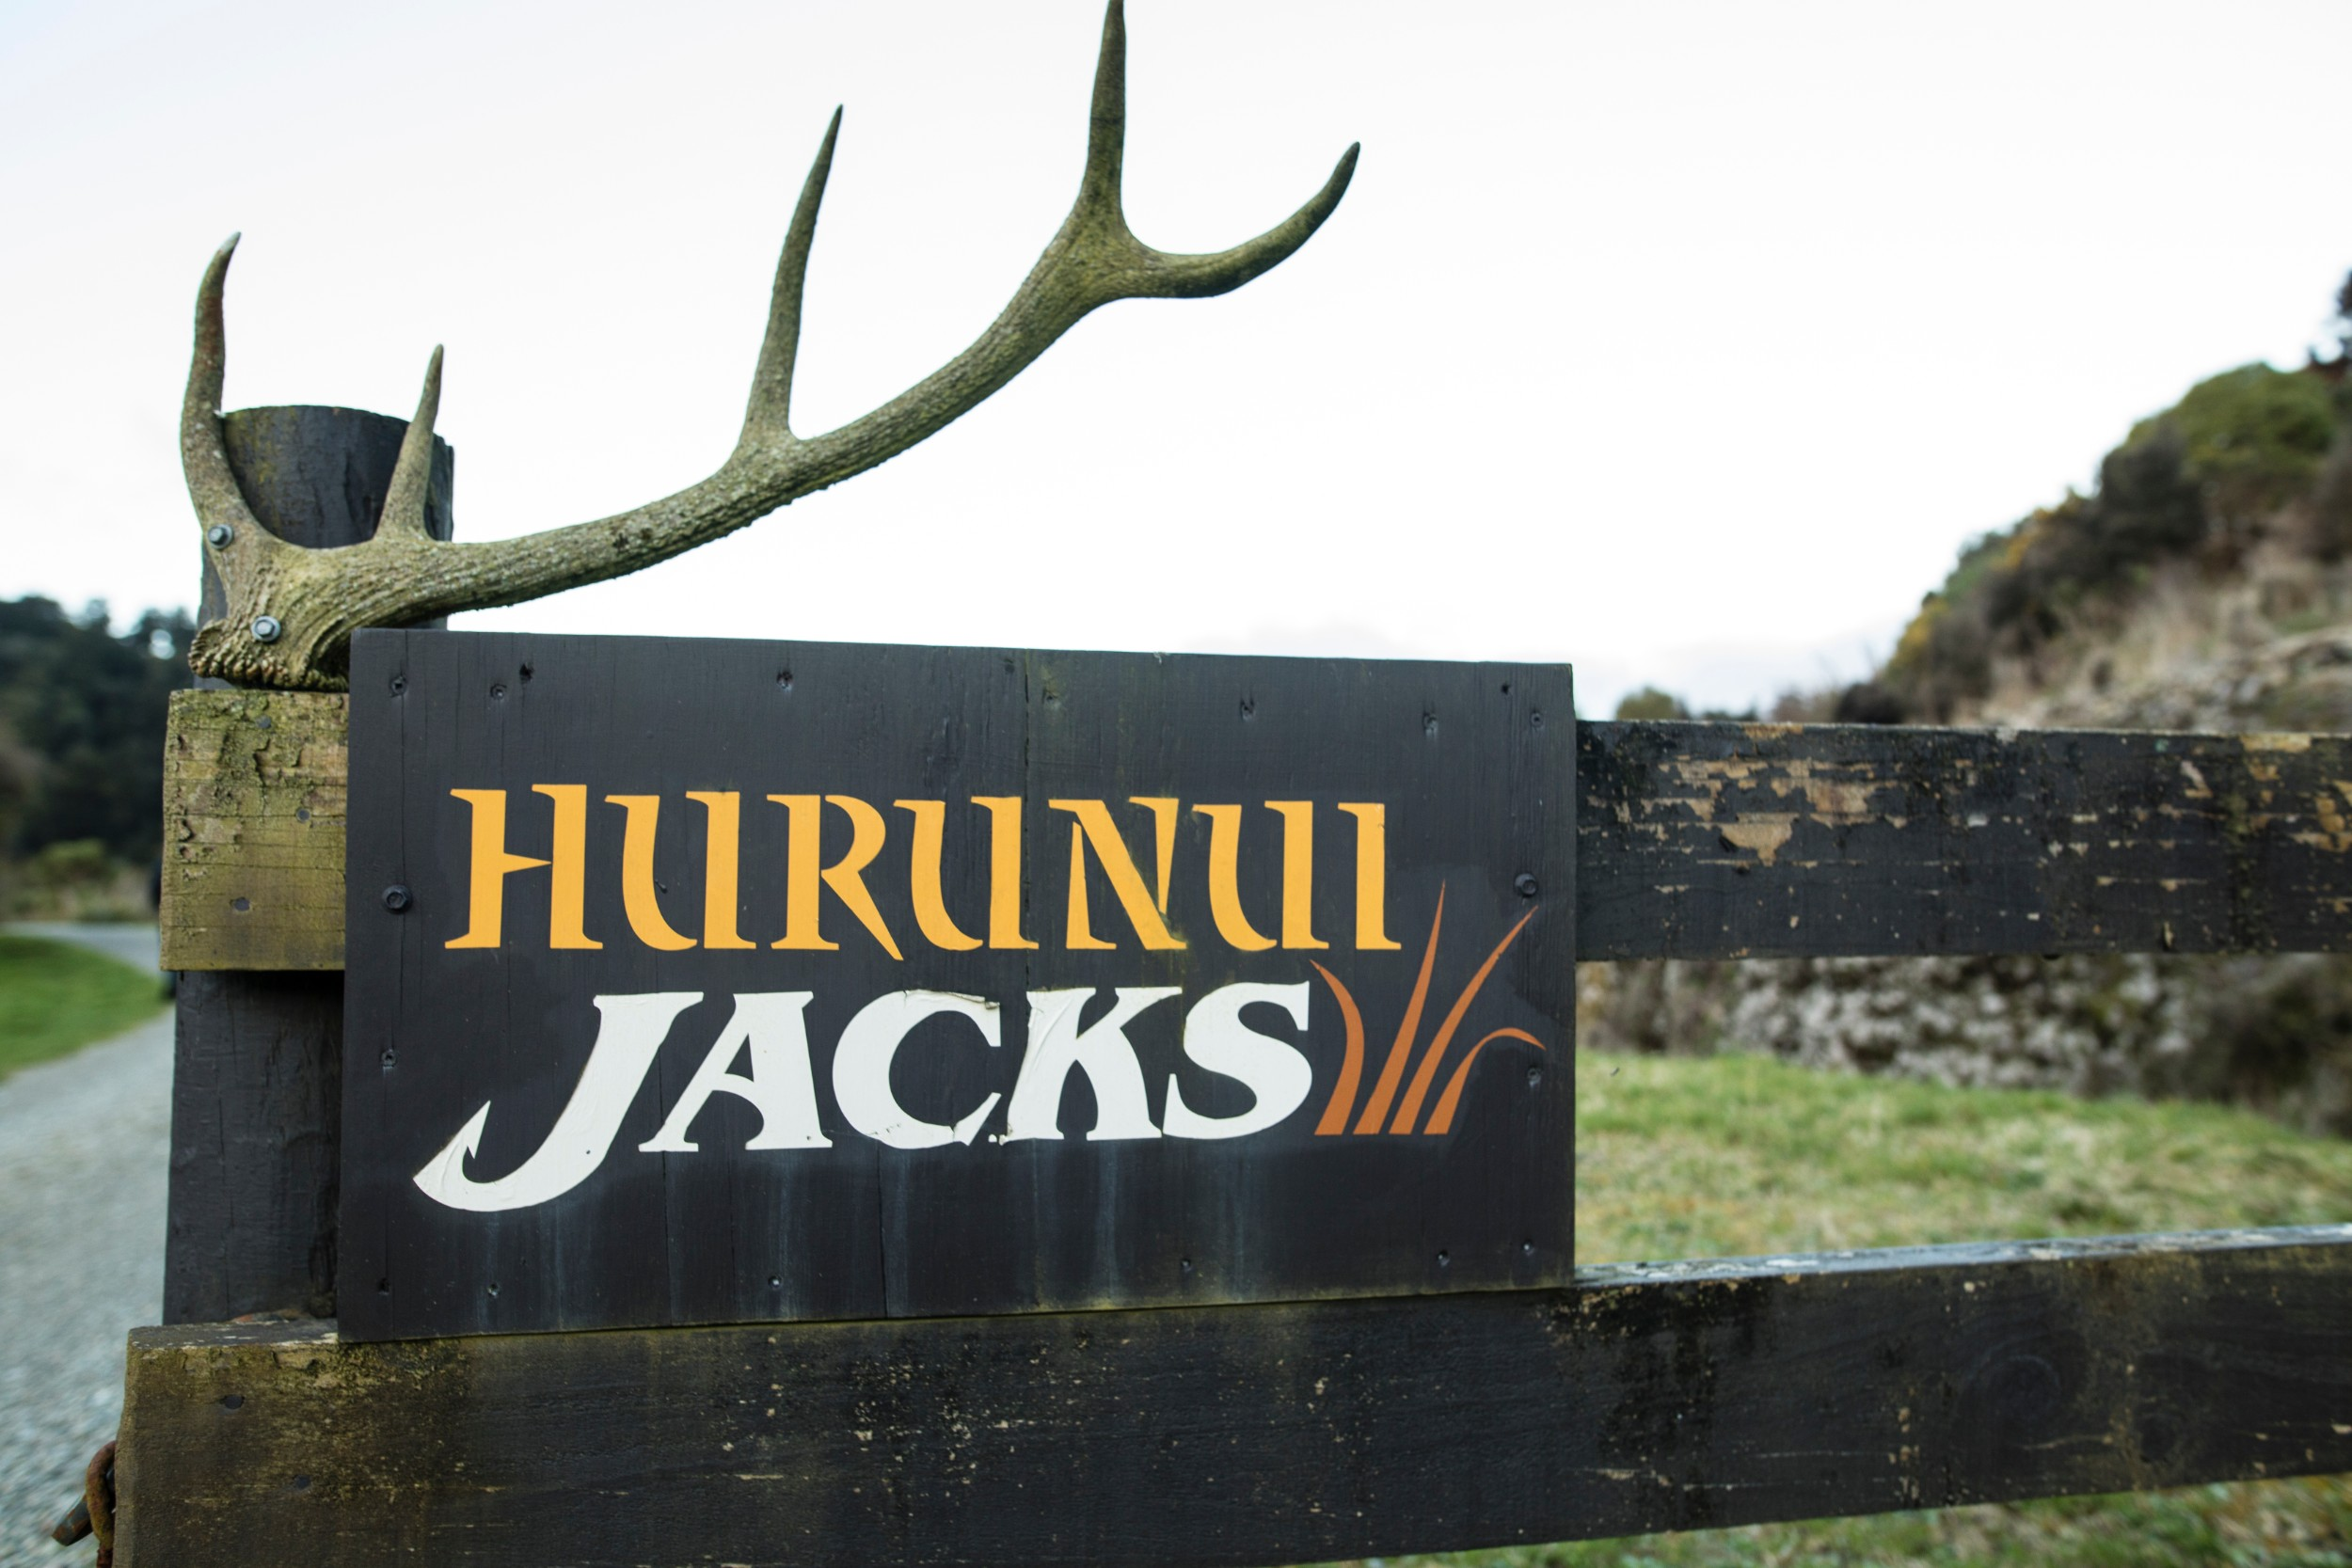 Hurinui Jacks full size54.jpg